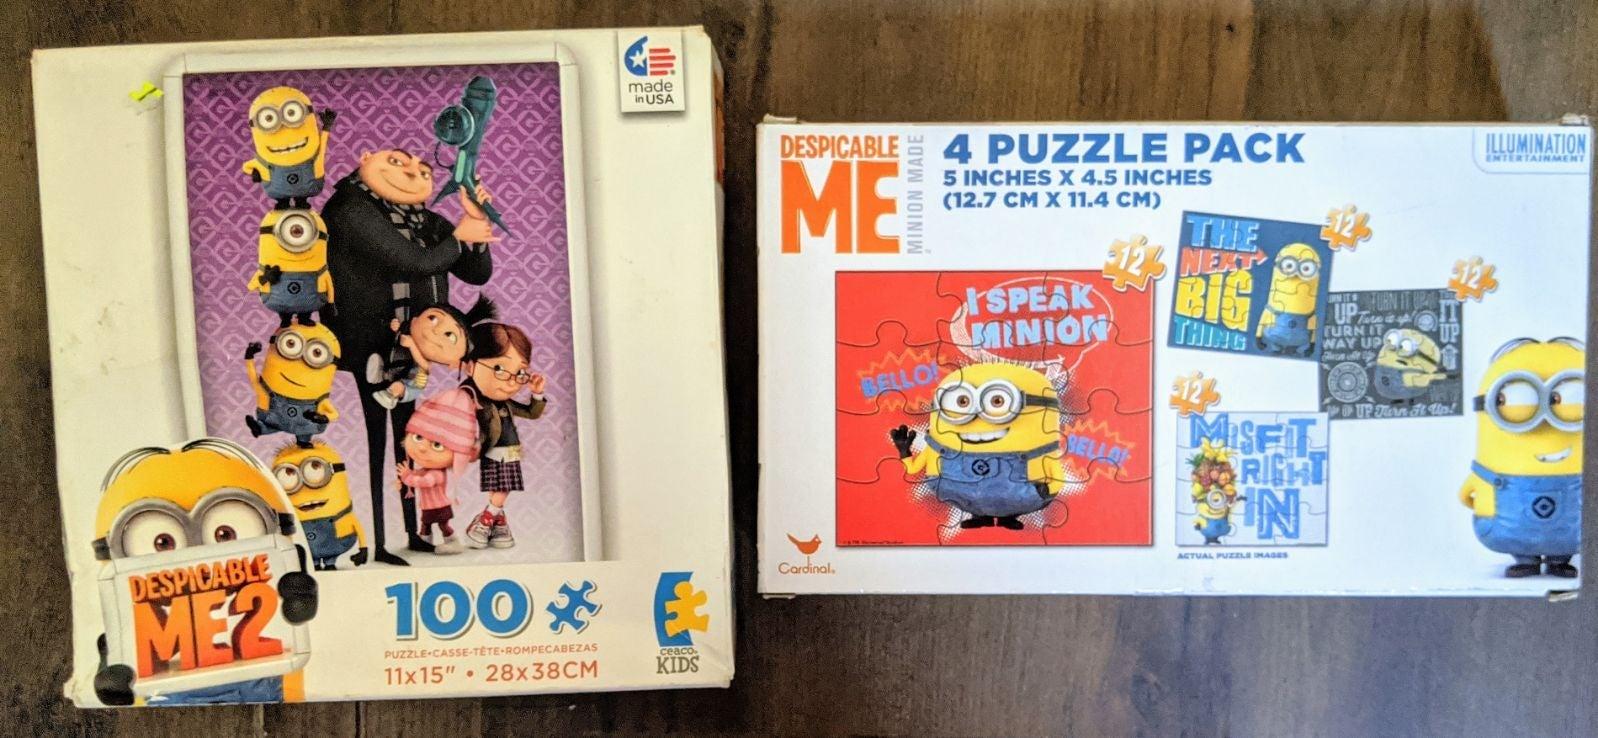 Despicable me minions puzzles